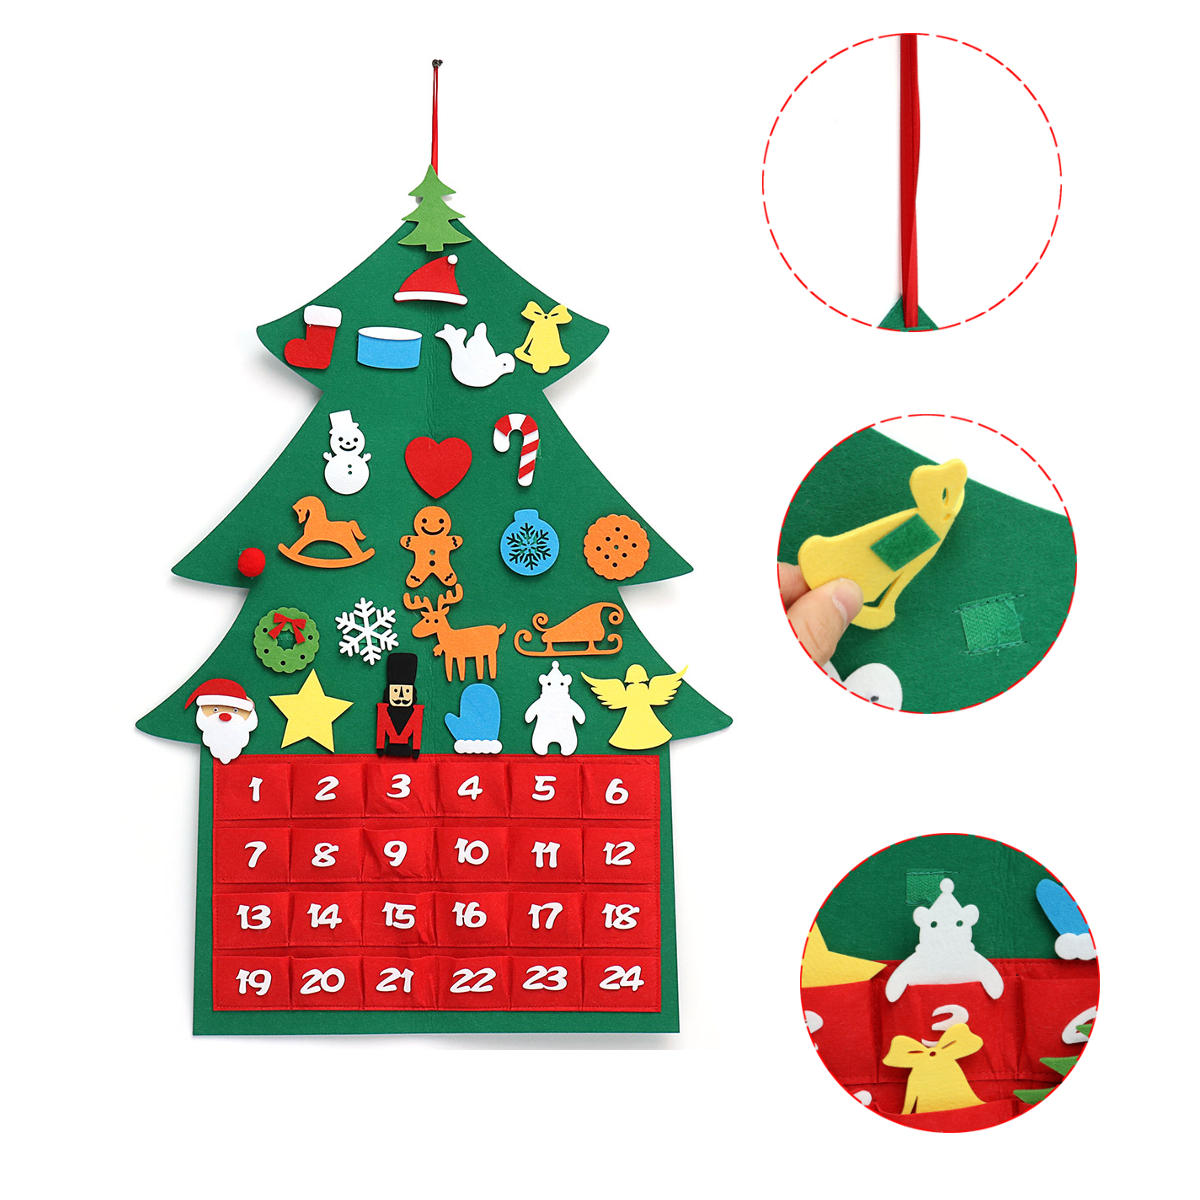 Christmas Tree Advent Calendar Felt Fabric Countdown Xmas Display Decor  Ornament.